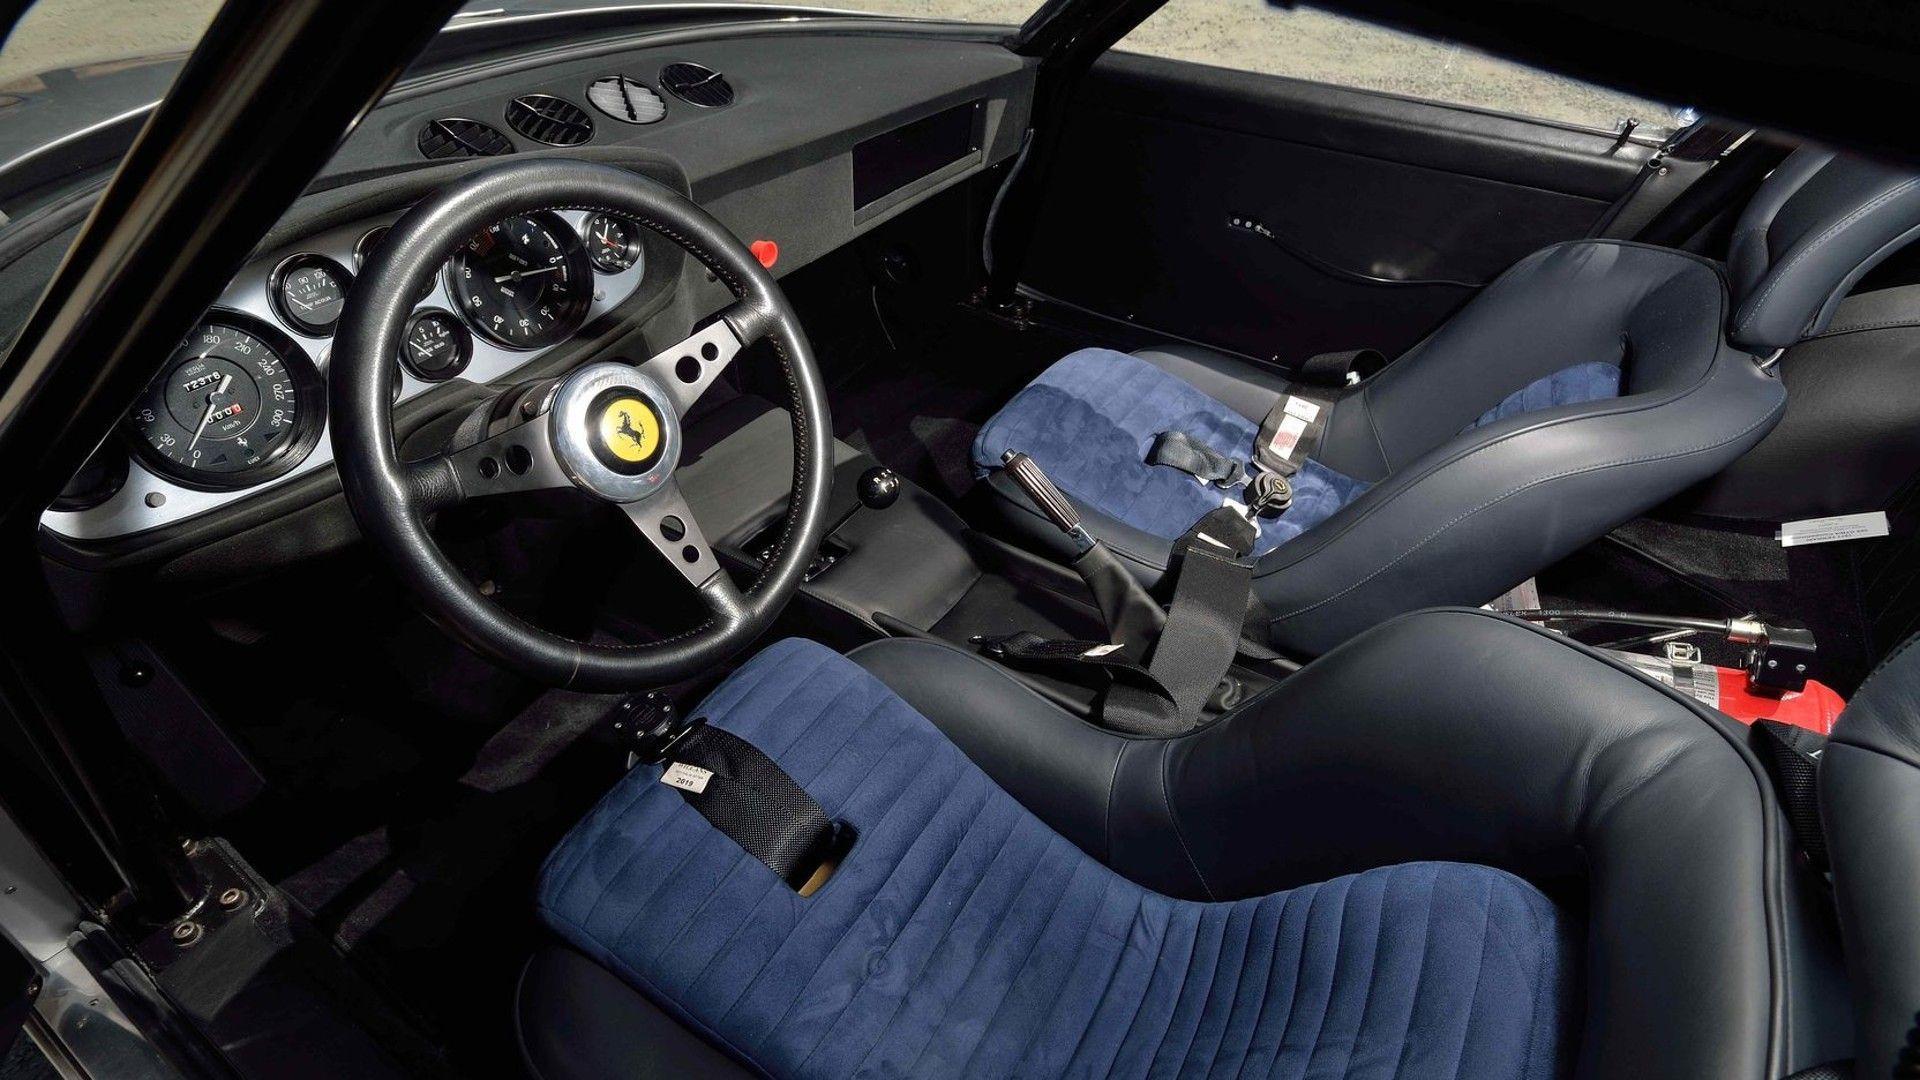 A 1971 Ferrari 365 GTB4 Daytona Competizione is heading to auction (3)